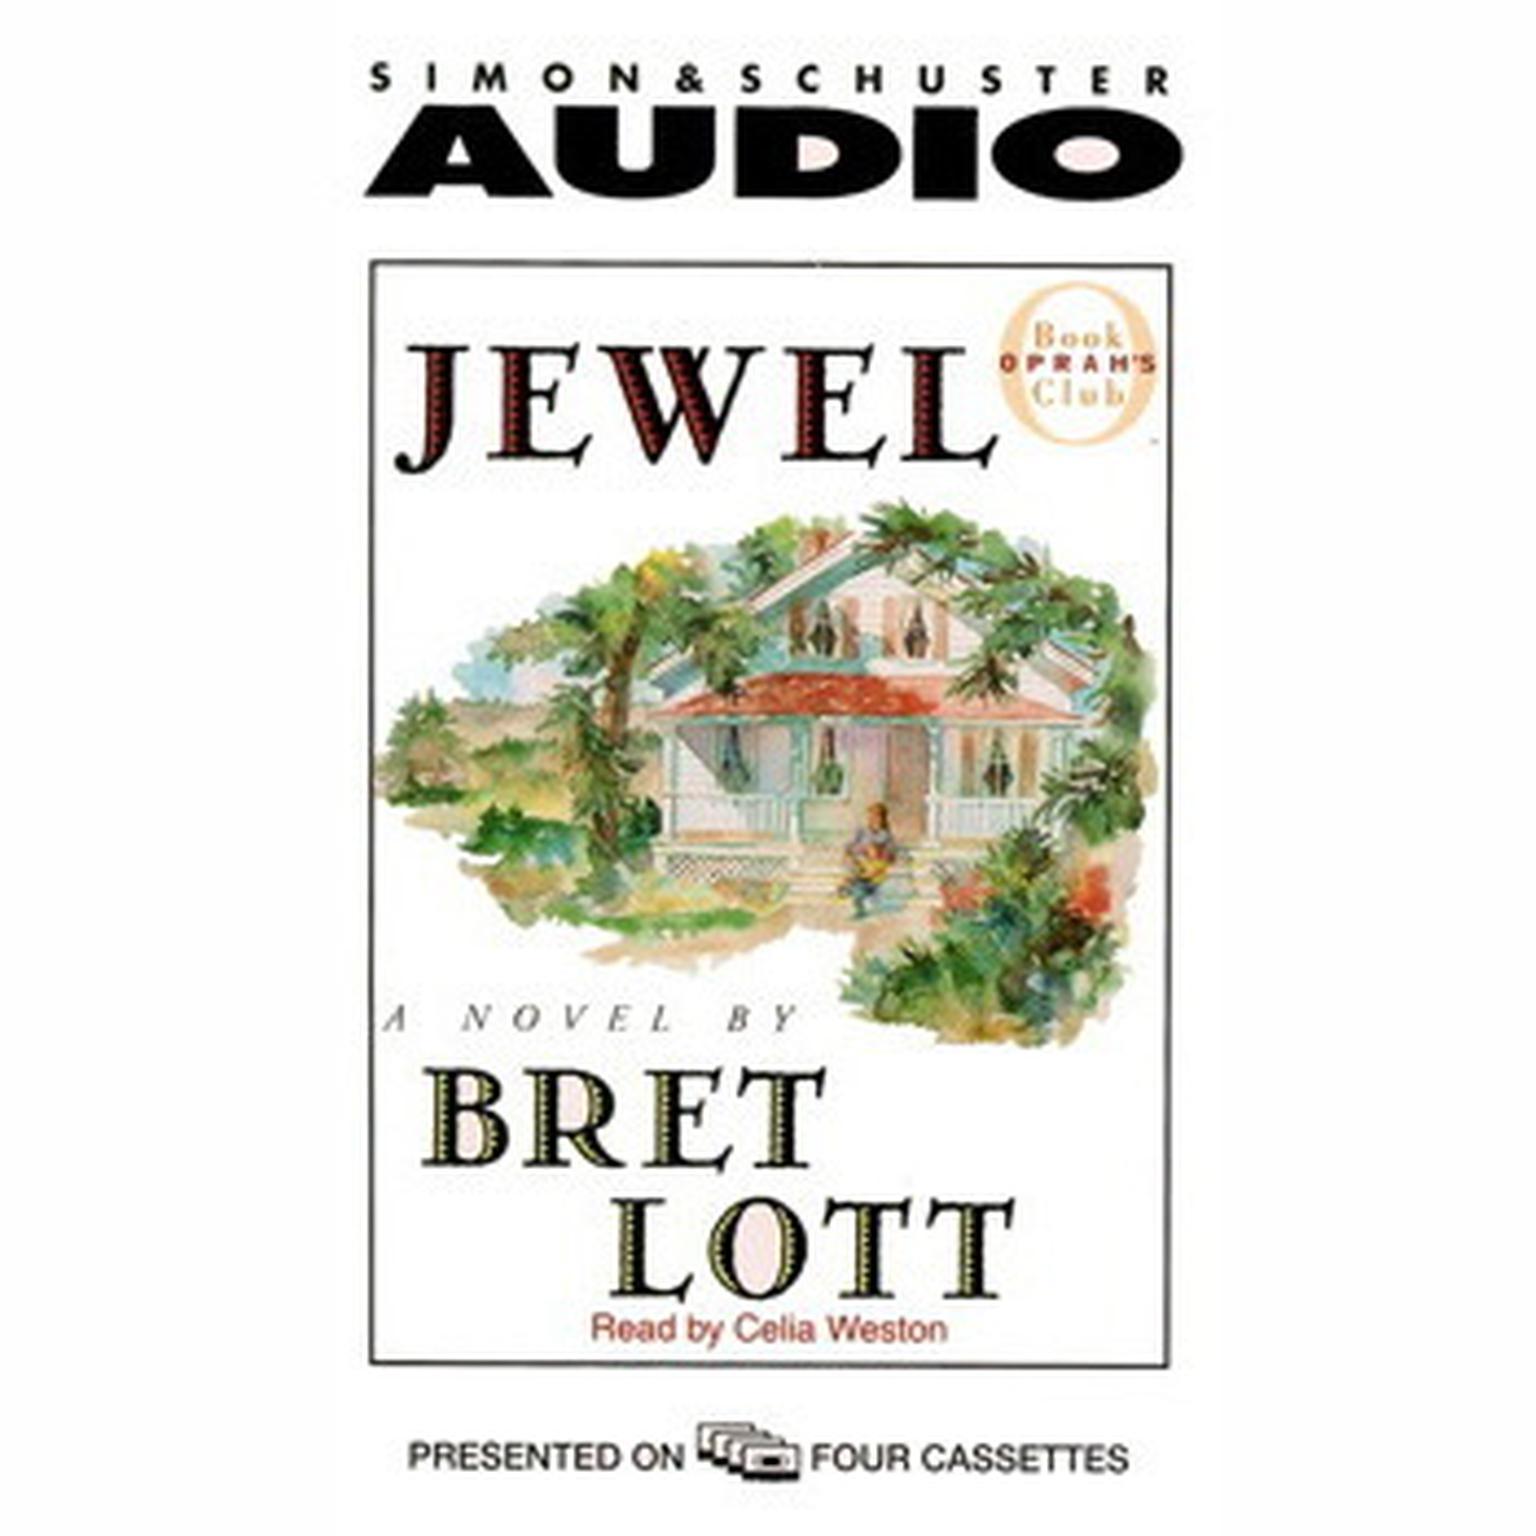 Jewel (Abridged) Audiobook, by Bret Lott